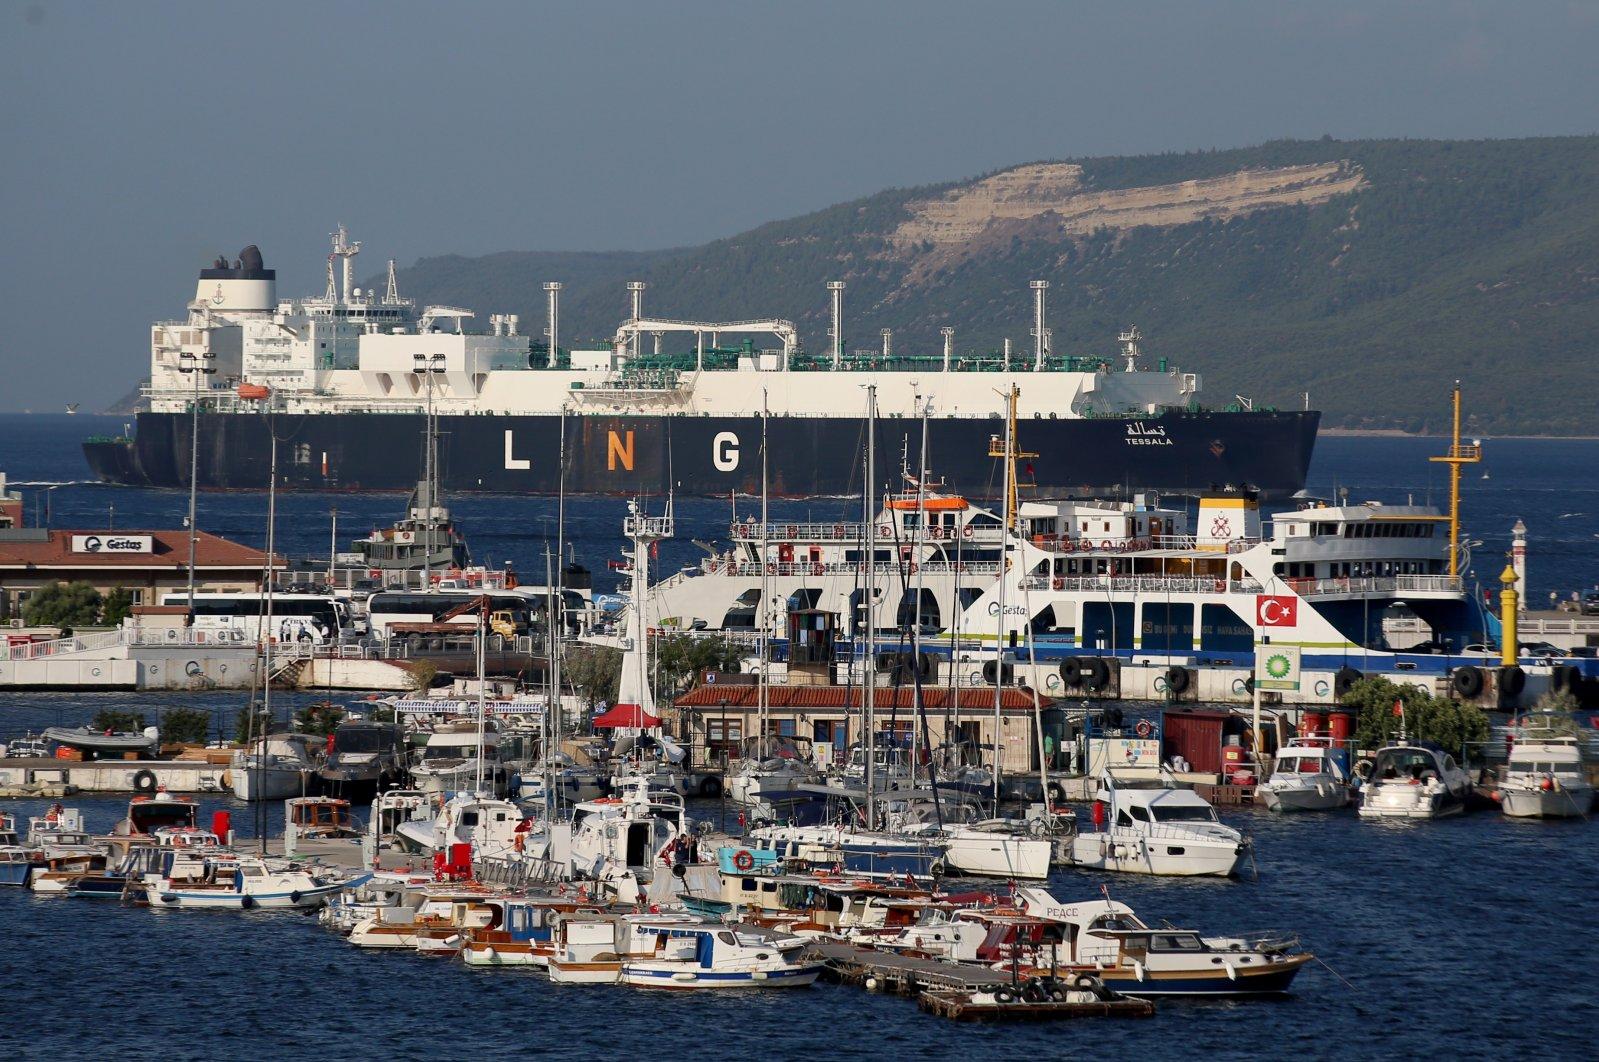 An LNG tanker passes through the Çanakkale Strait, Turkey, Aug. 13, 2021. (AA Photo)